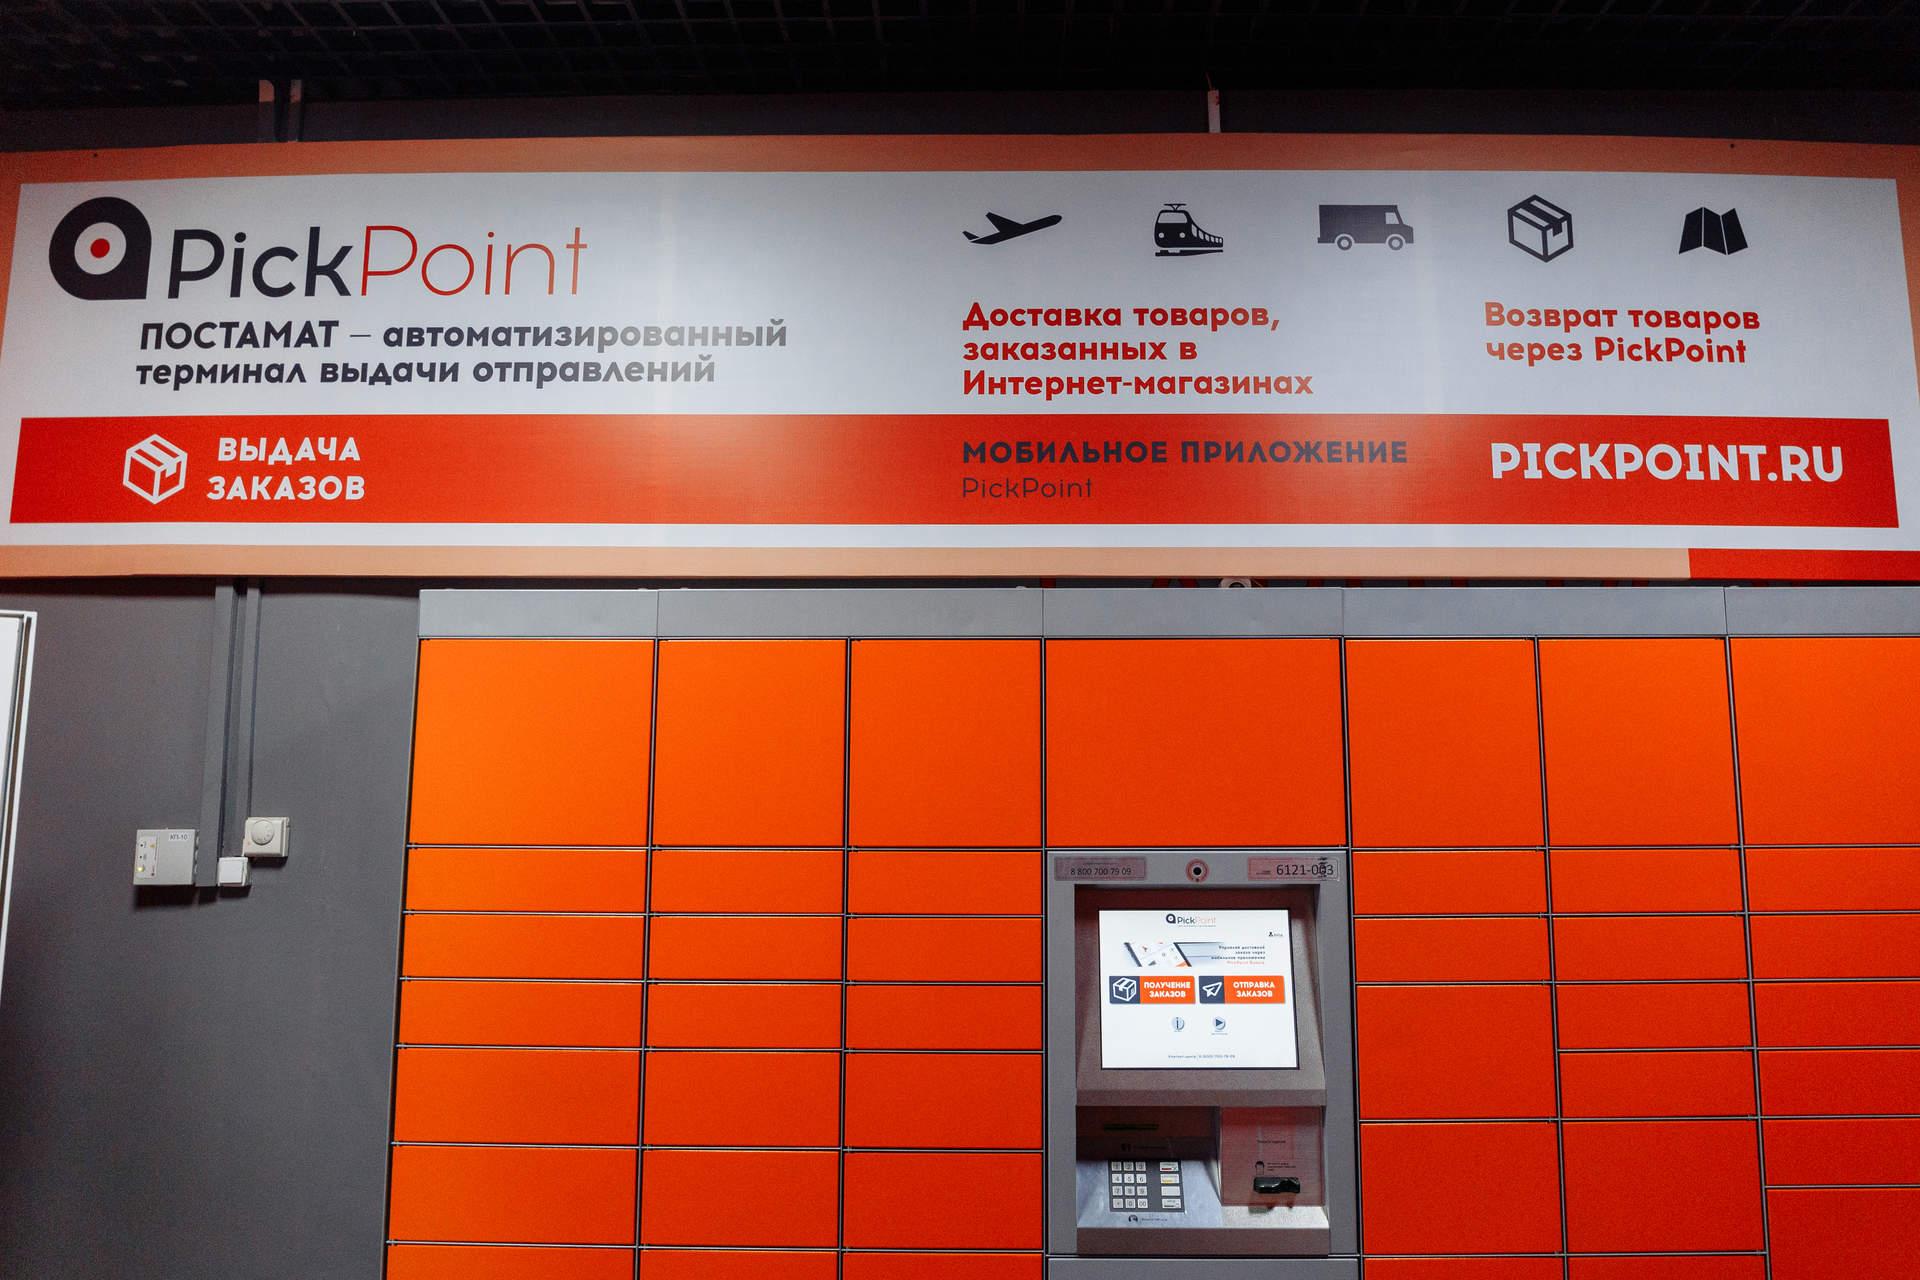 В даркнете выставлена на продажу SQLi уязвимость на Pickpoint.ru